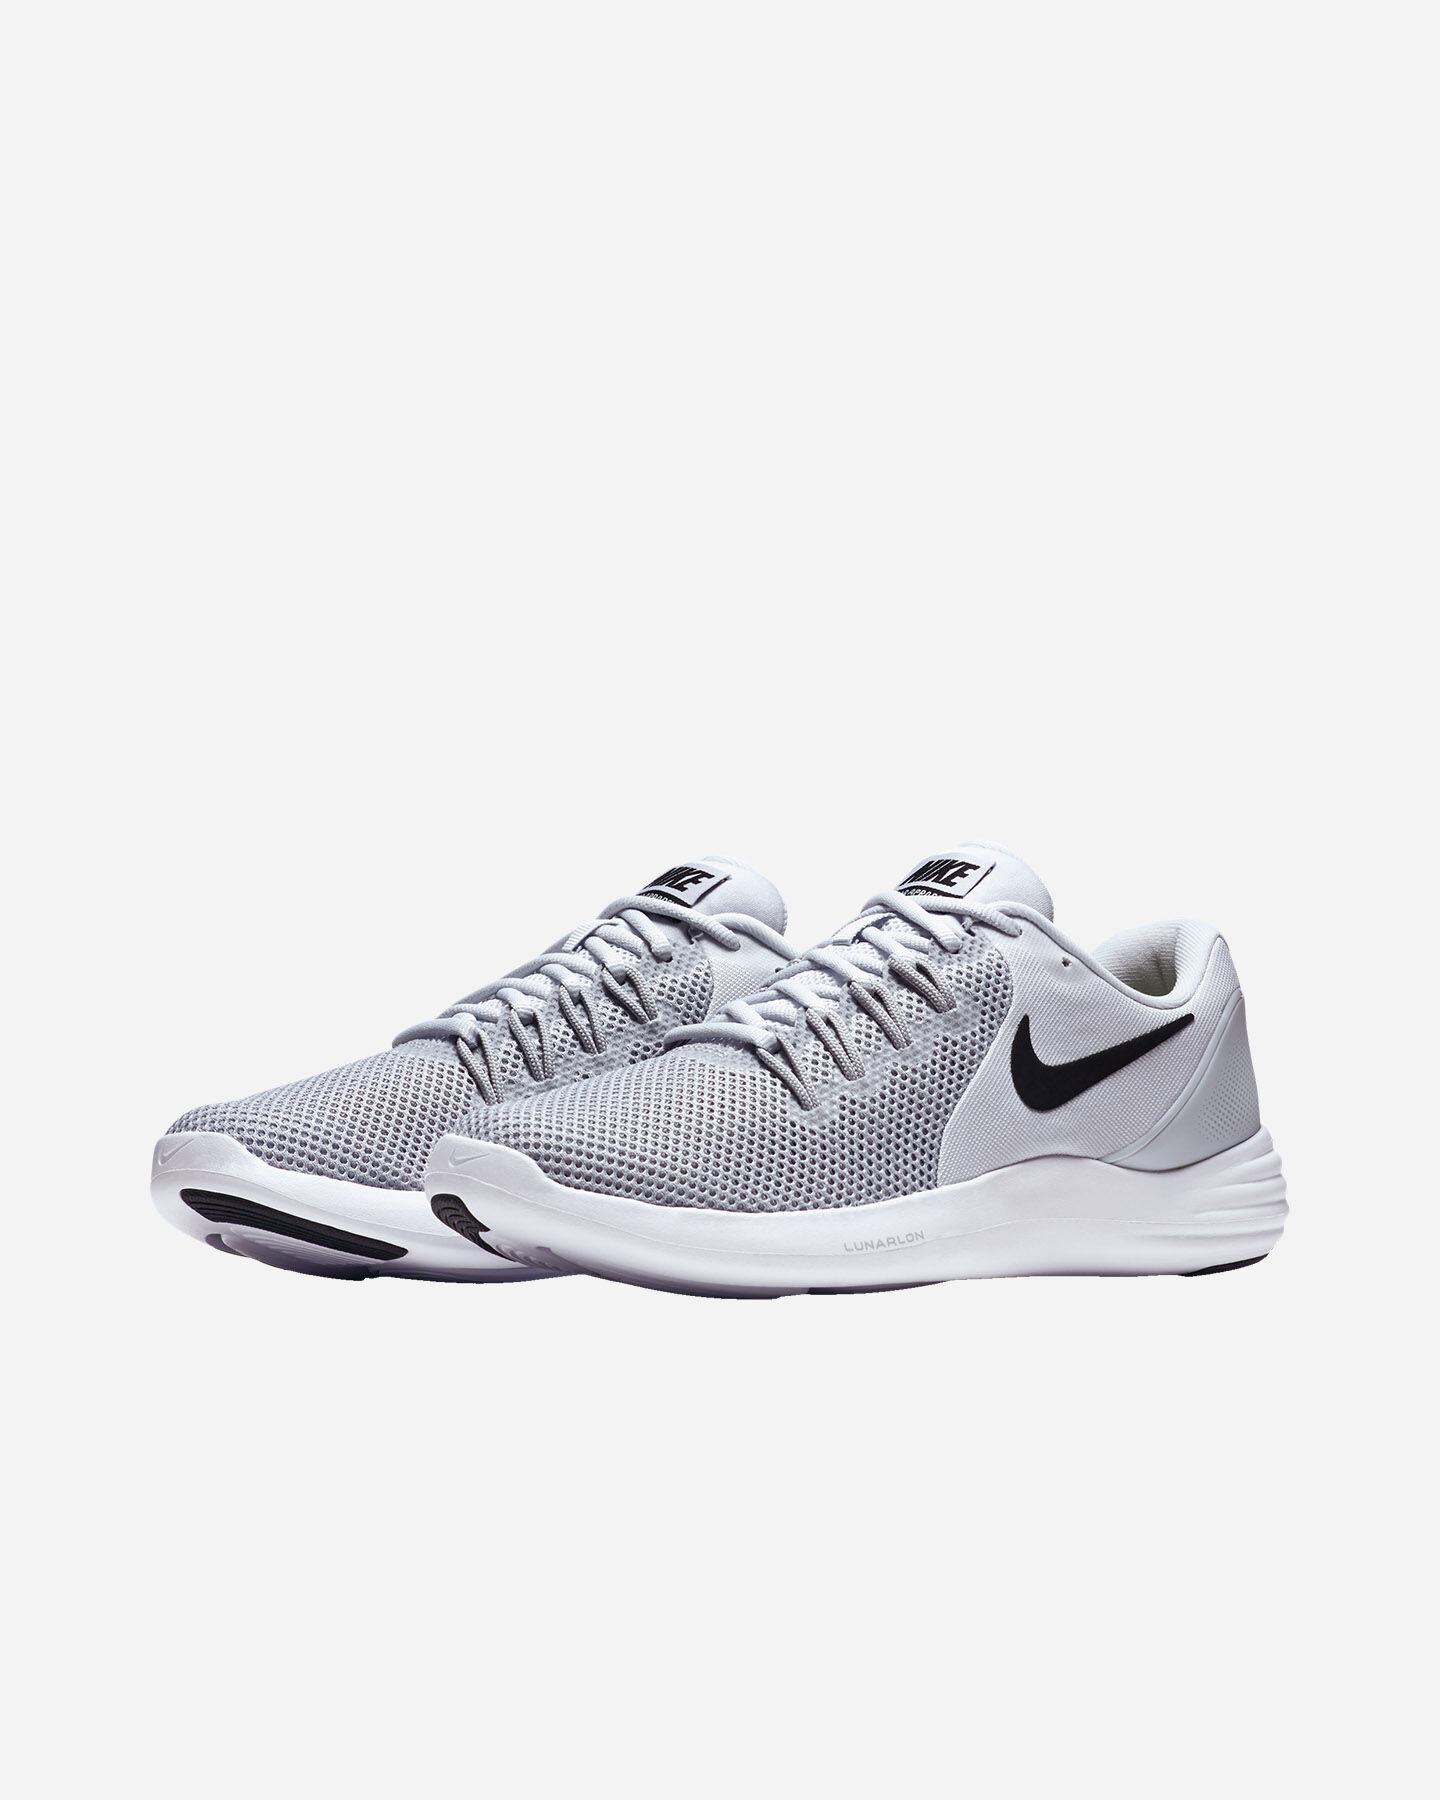 Stubborn overseas Melt  Scarpe Running Nike Lunar Apparent M 908987   Cisalfa Sport